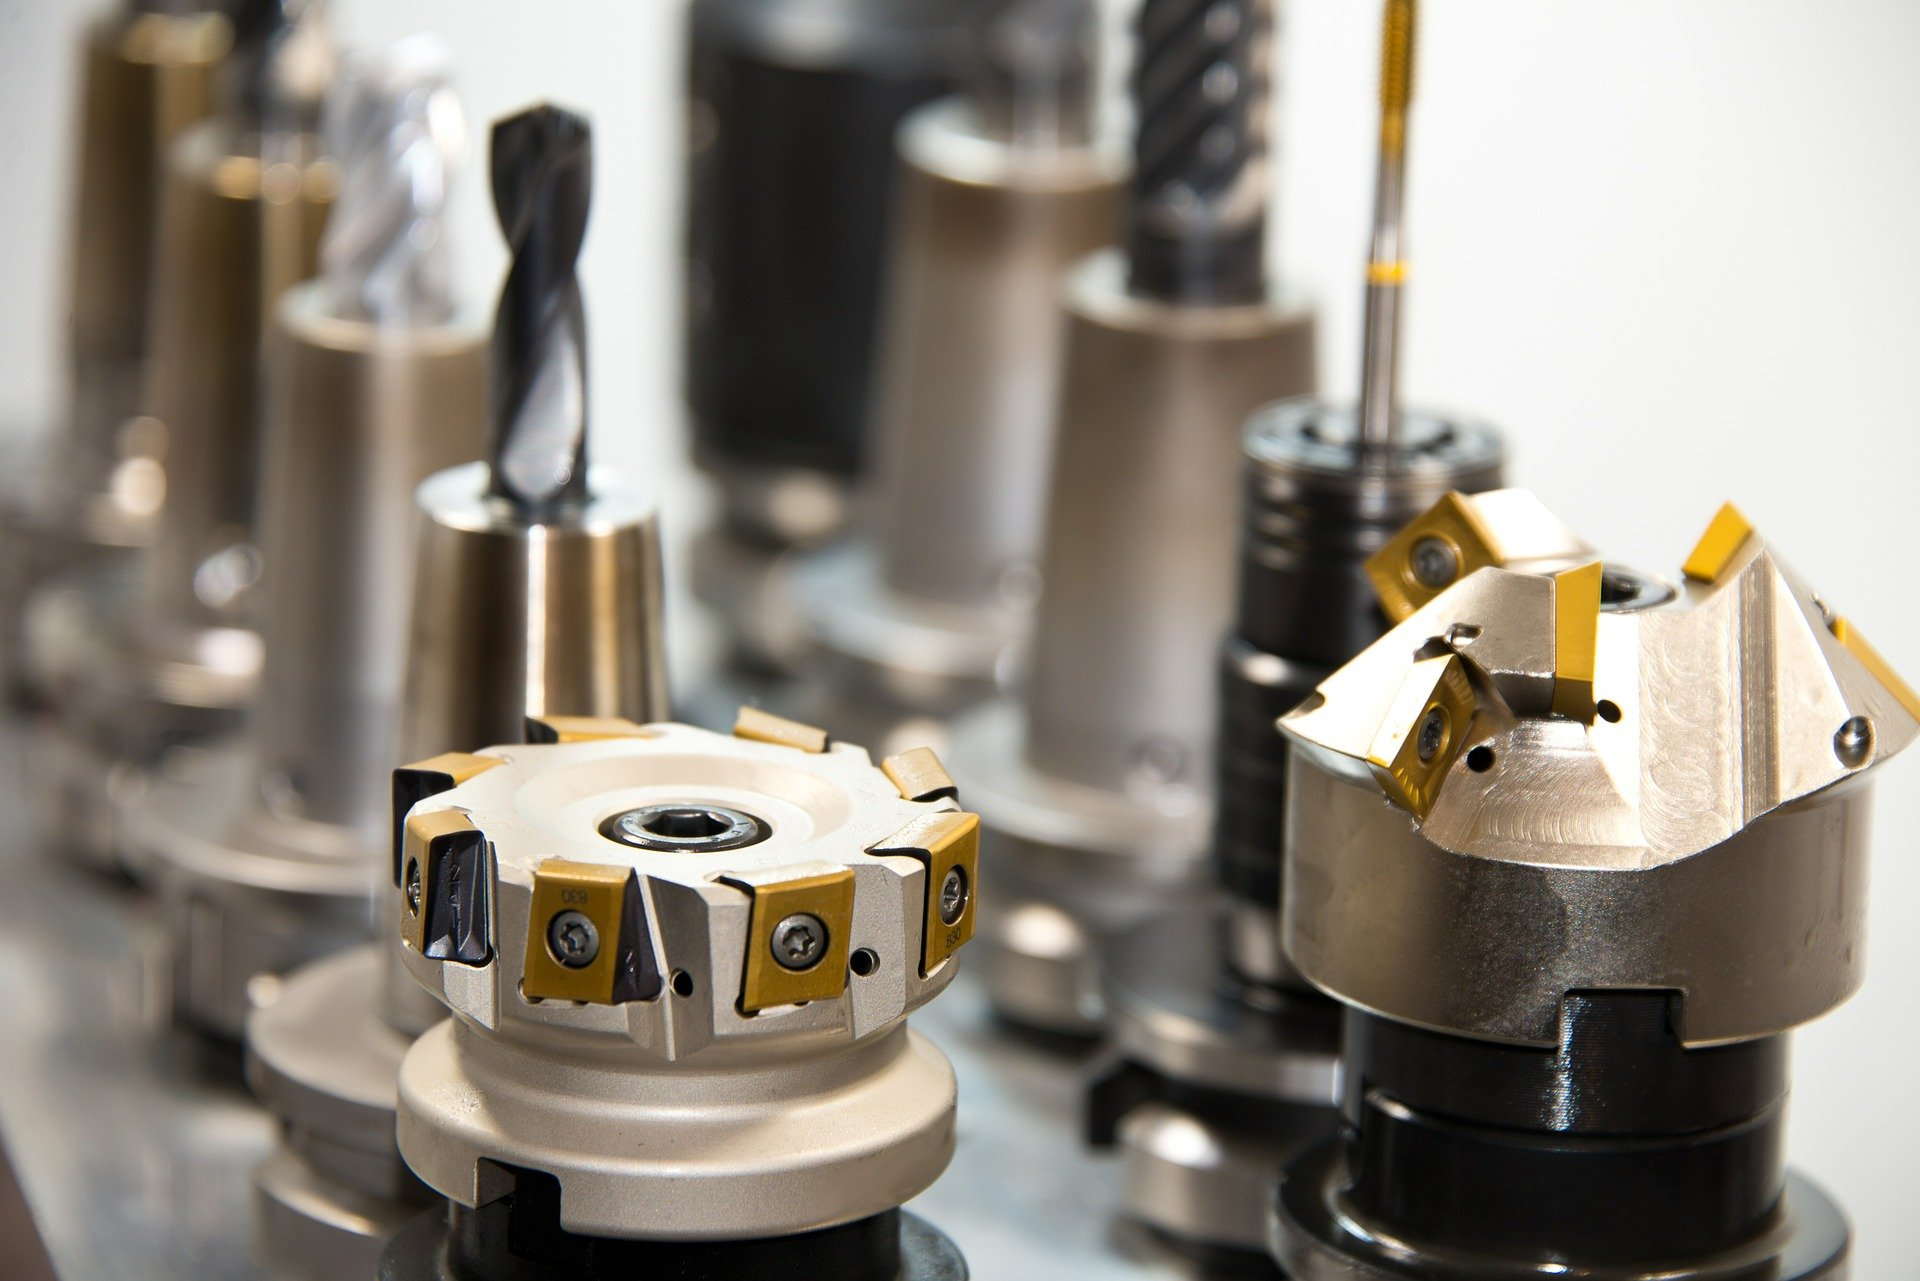 Manufacturing translation services